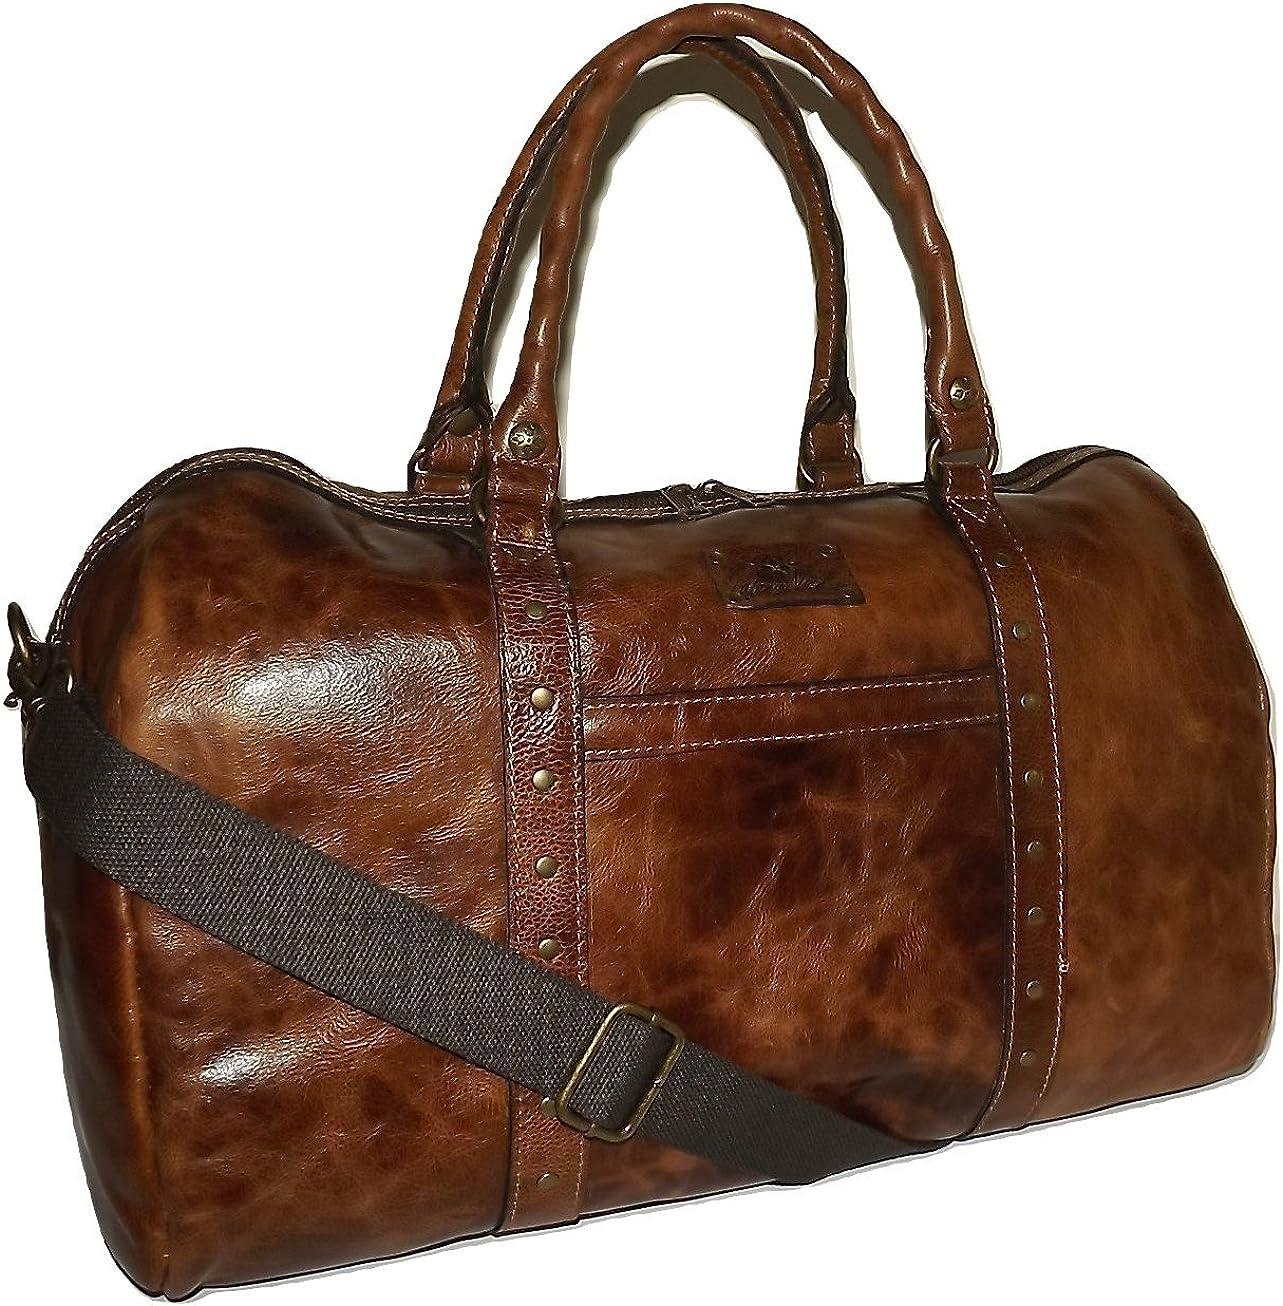 Patricia Nash Vintage Italian Leather 20 Milano Duffel Bag Luggage Cognac, Medium